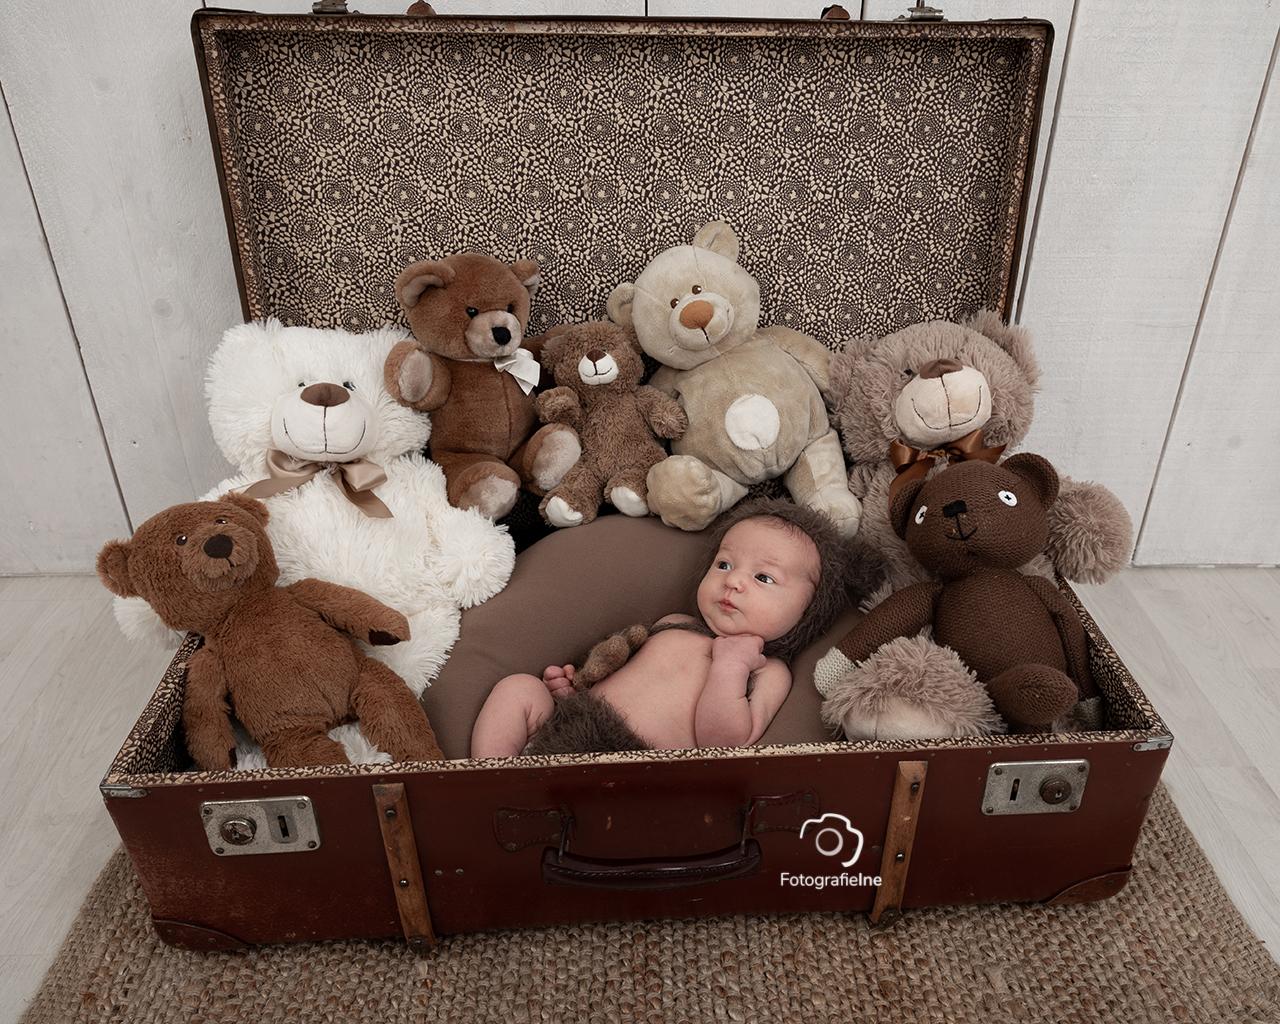 Fotografie-Ine 233A2028 newborn baby beren koffer berenmutsje newborn